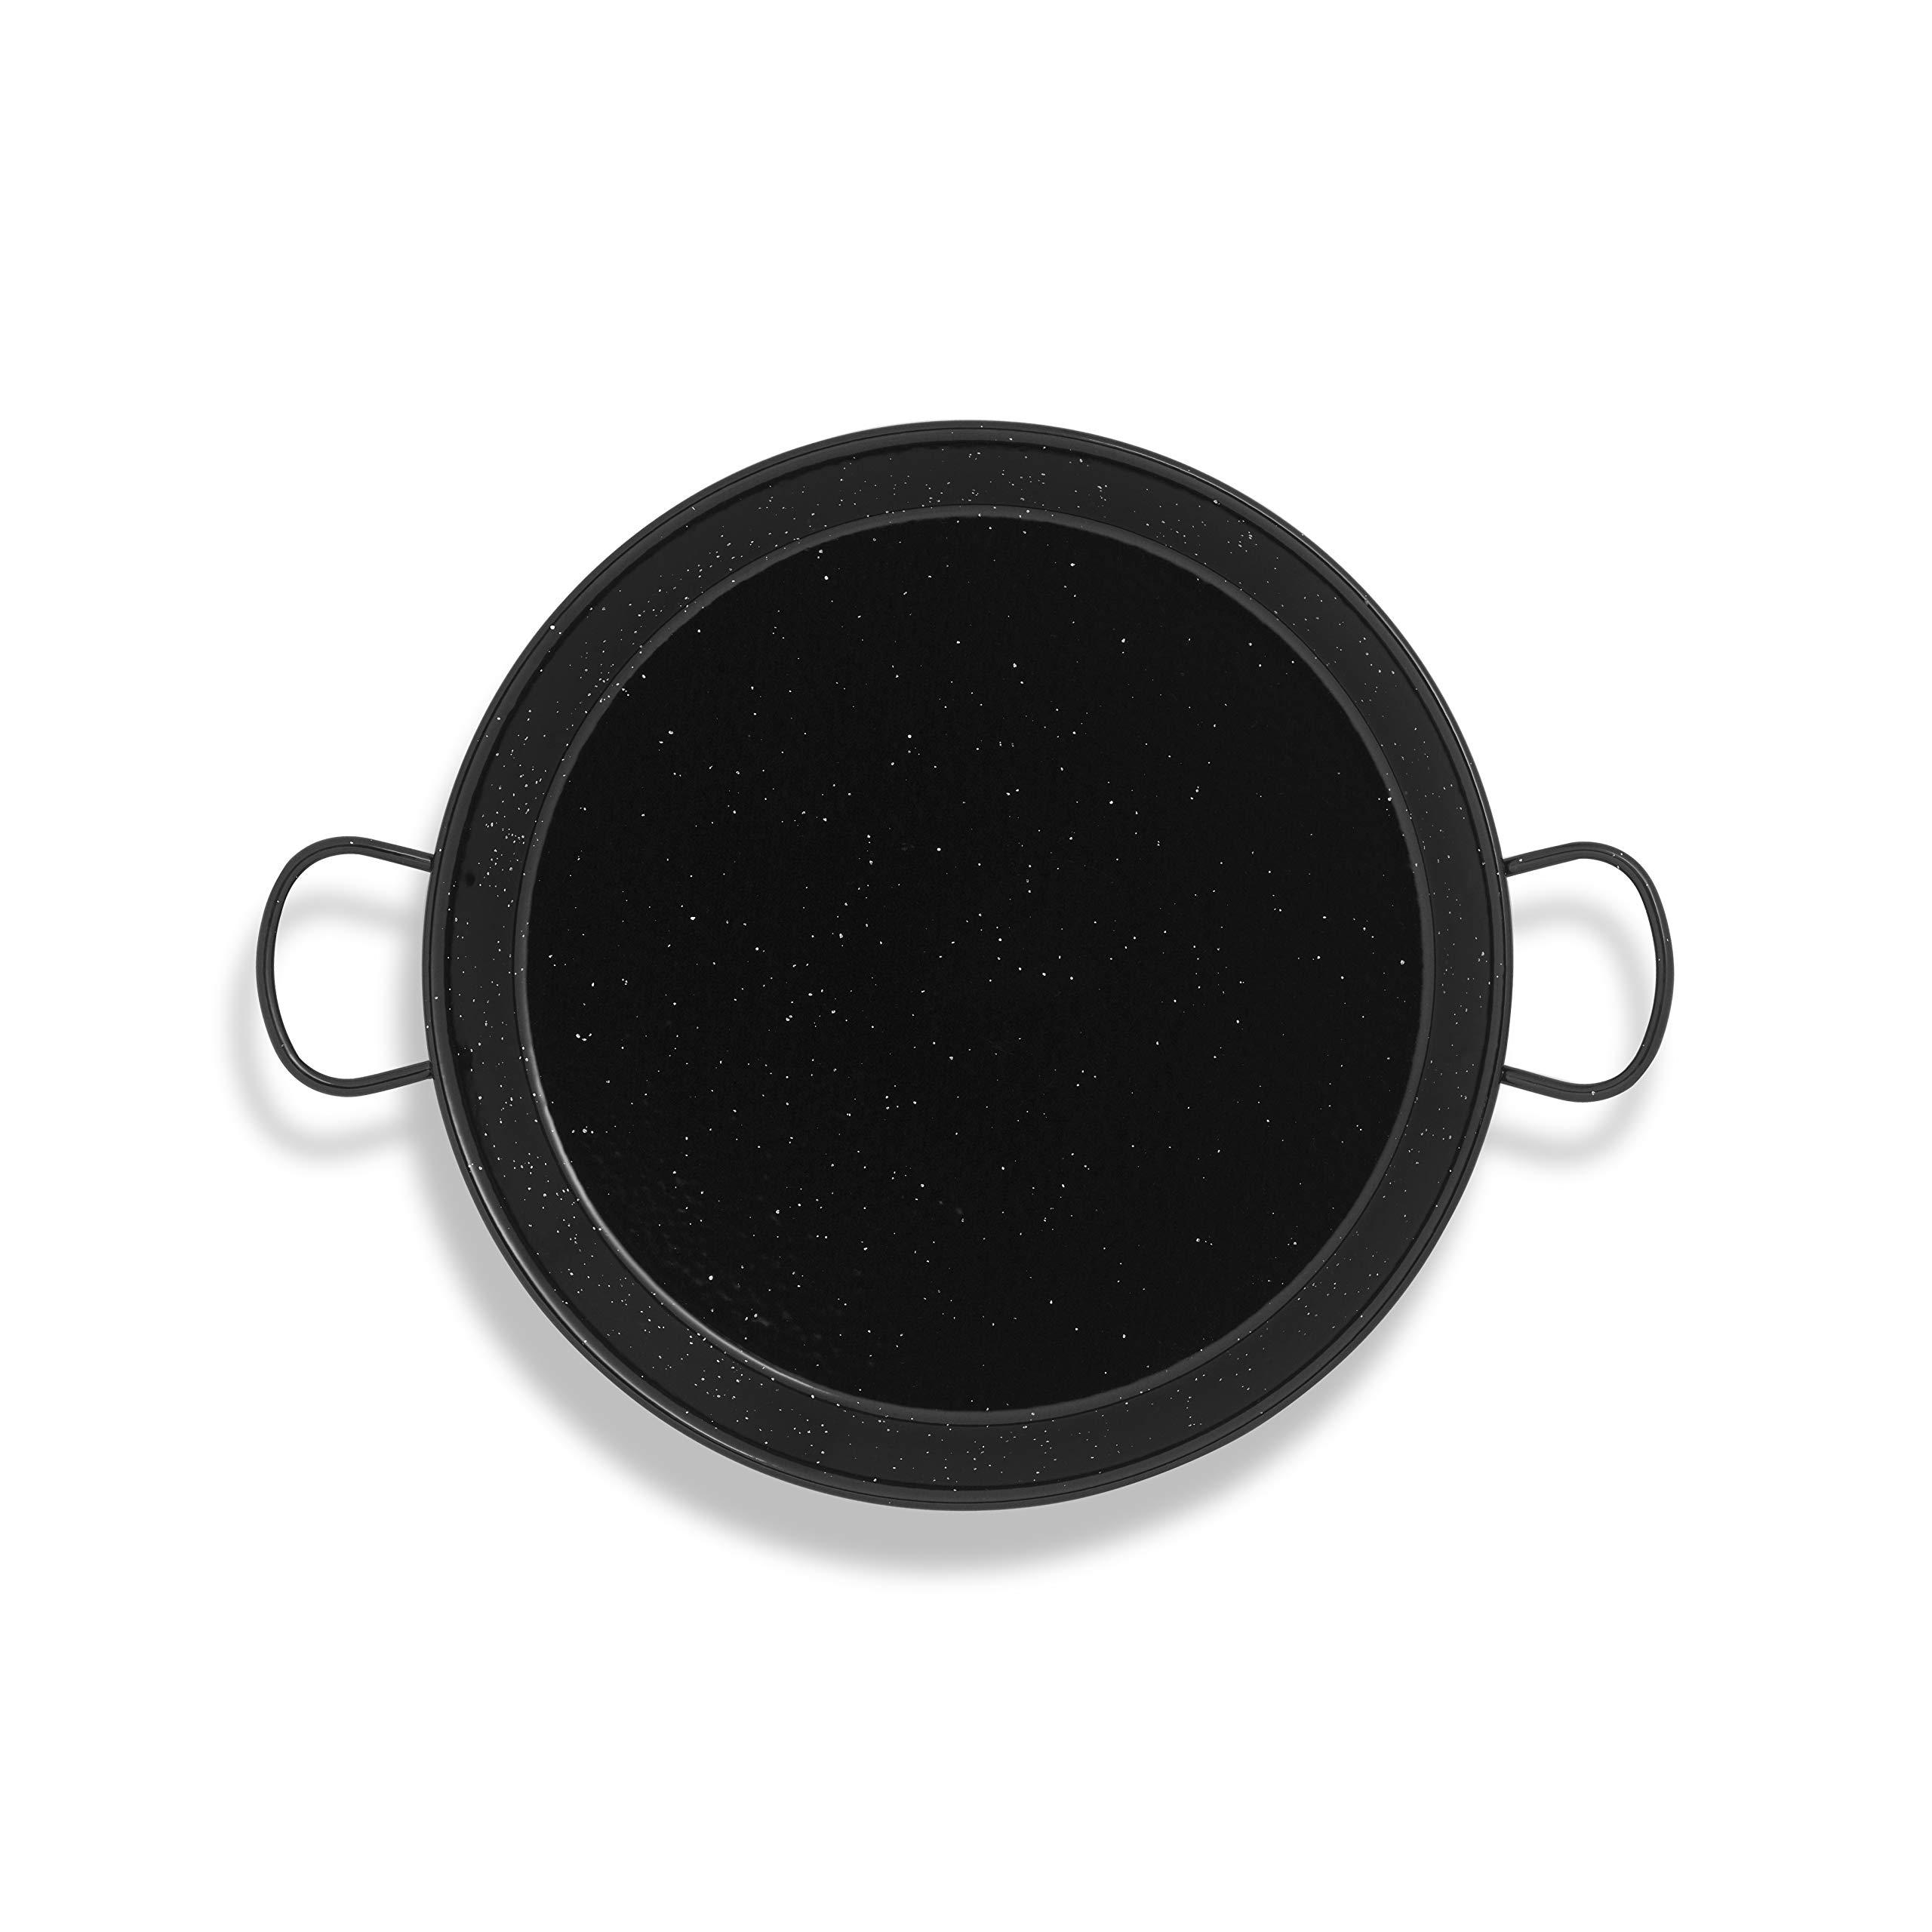 Metaltex - Paellera esmaltada 34 cm product image